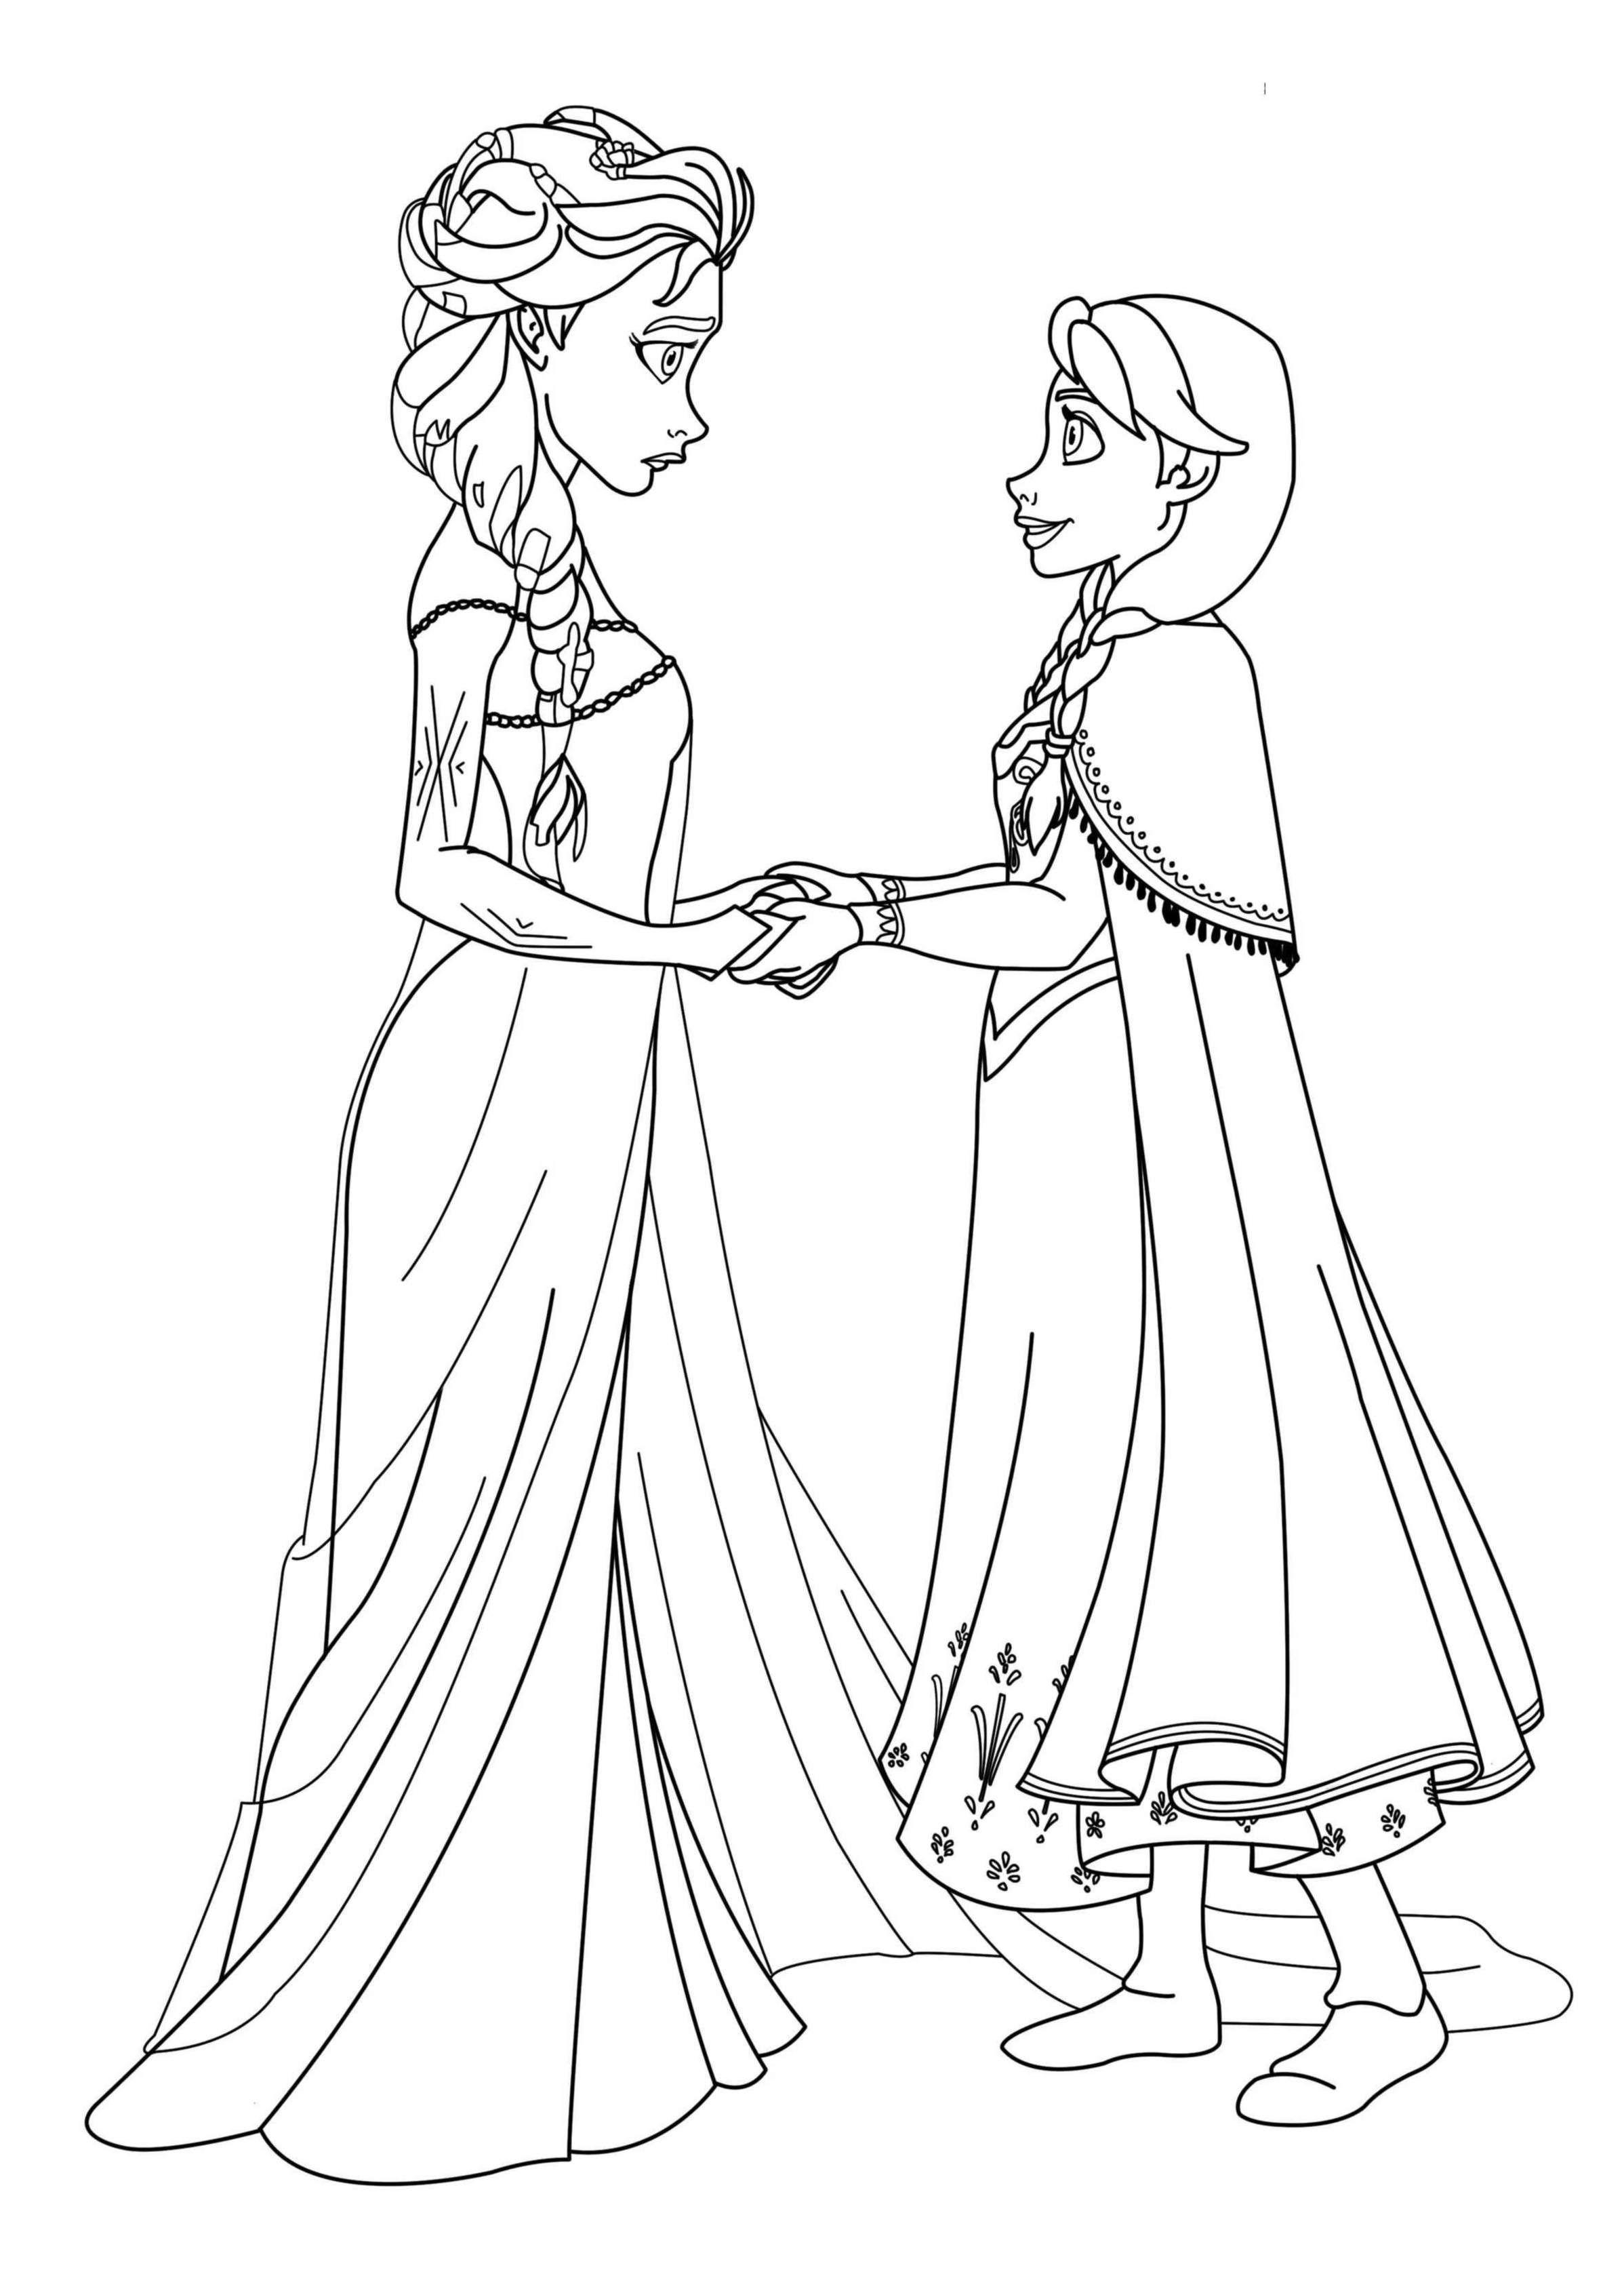 Dibujos de las Princesas de Frozen para pintar | Colorear ... | Para ...